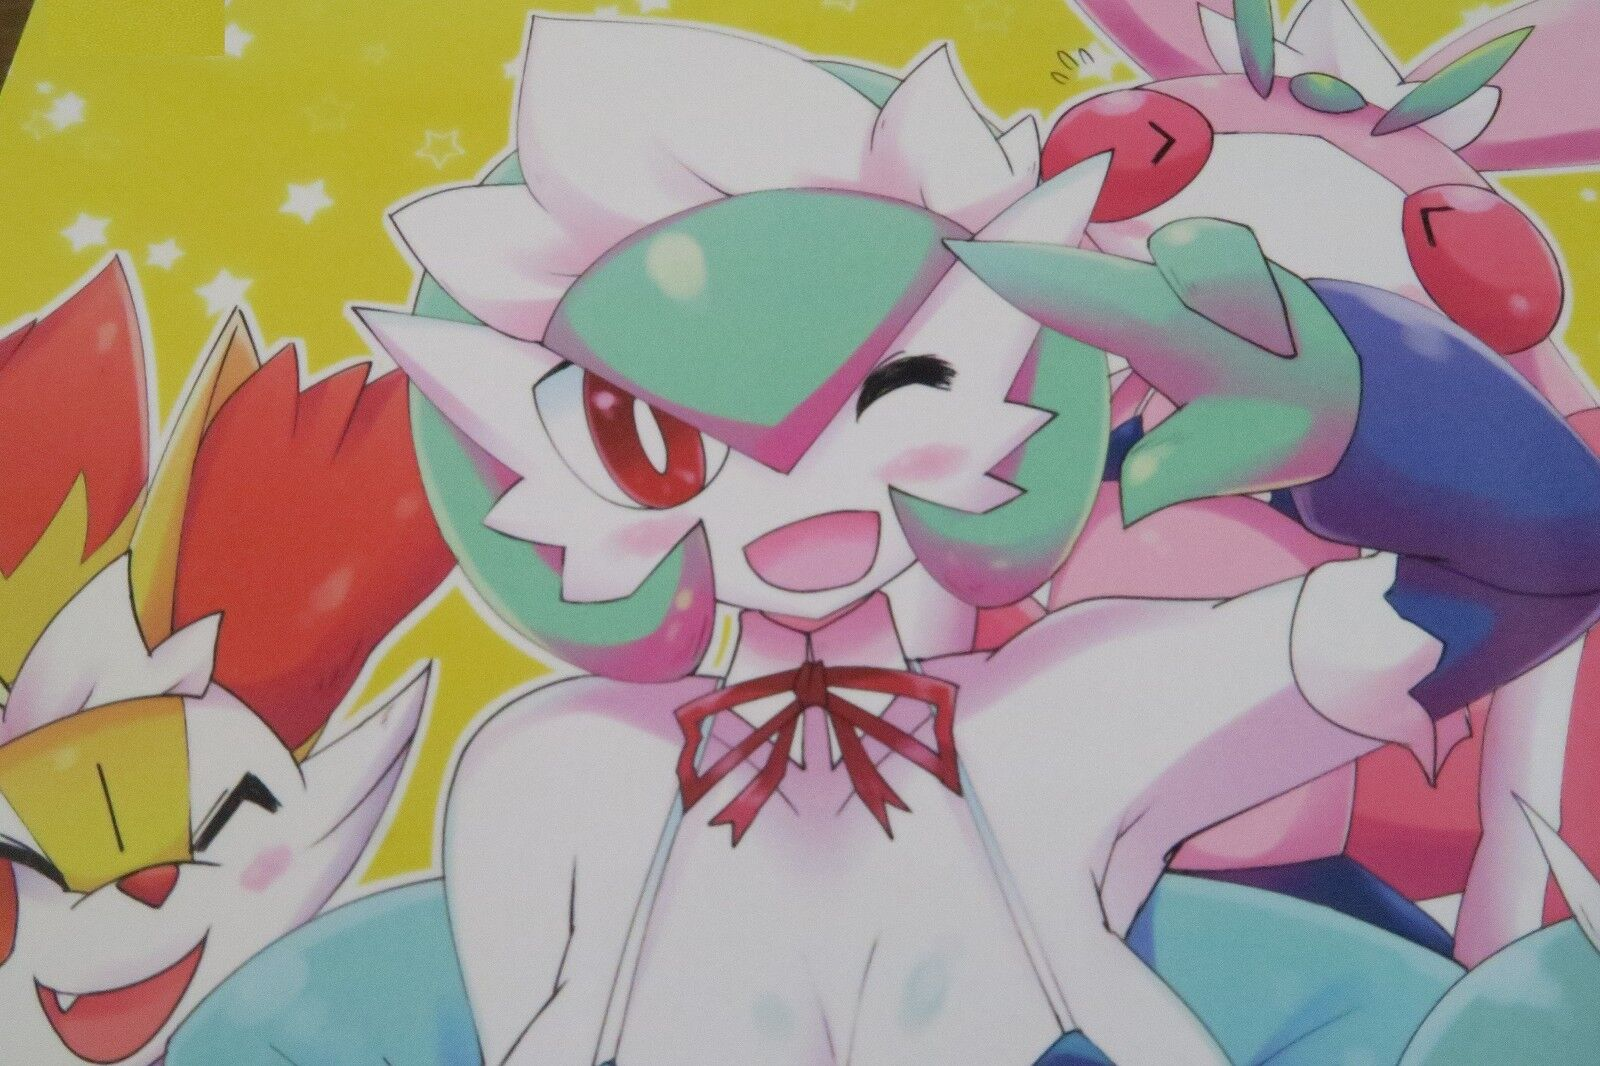 Pokemon Doujinshi Gardevoir (B5 28pages) Metallisch Stahl Ikanomaru Fuyu Furry